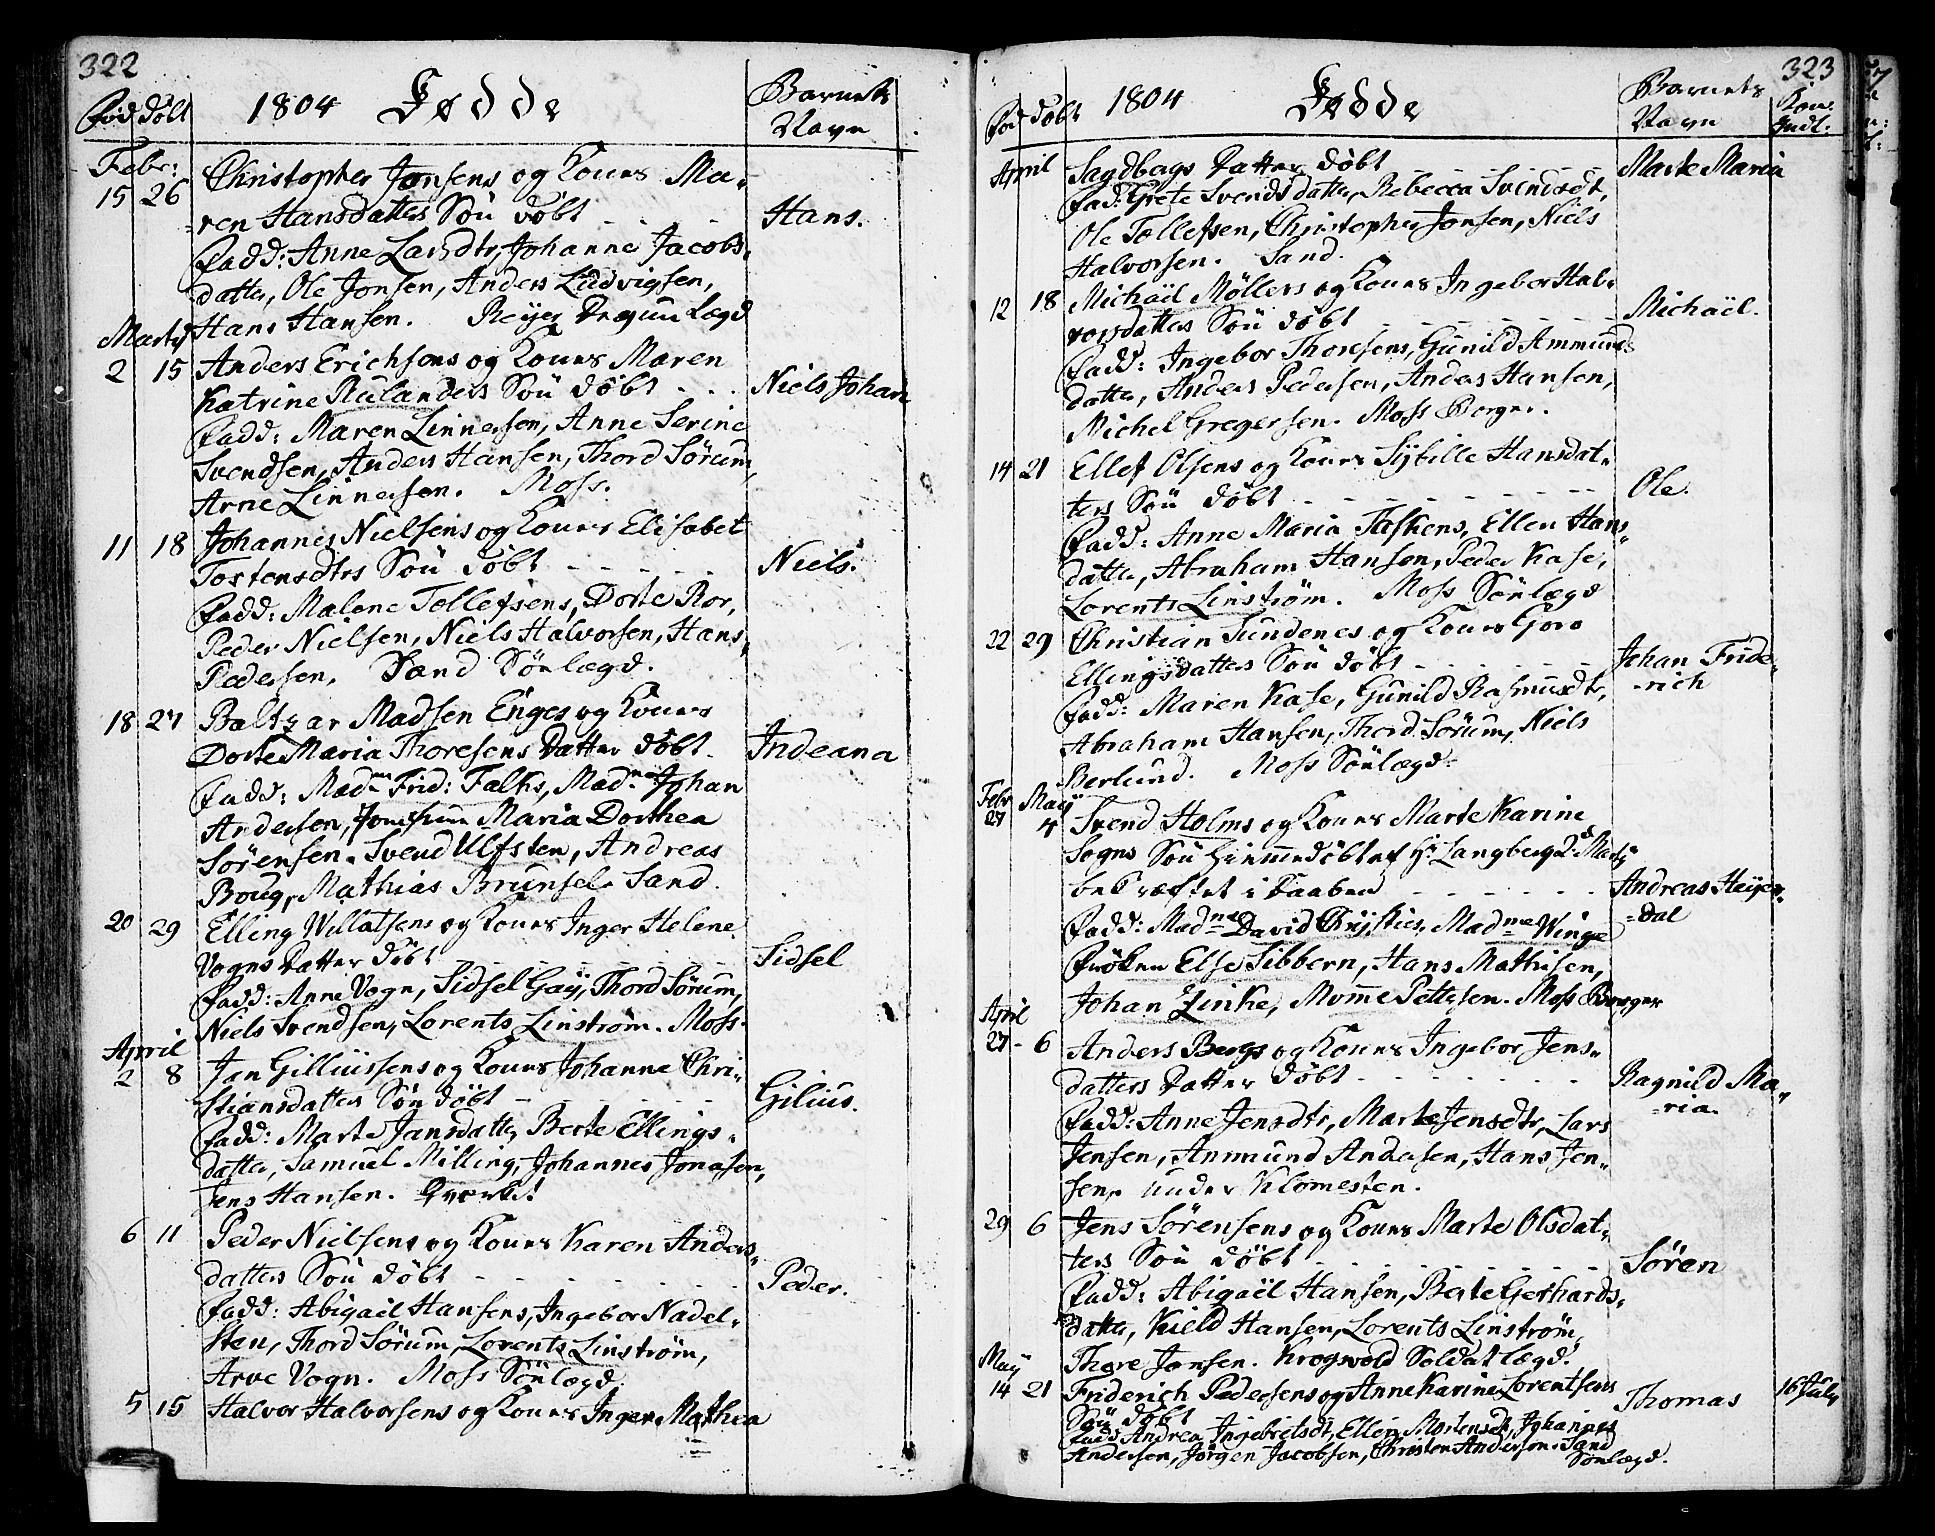 SAO, Moss prestekontor Kirkebøker, F/Fa/Faa/L0004: Parish register (official) no. I 4, 1784-1808, p. 322-323